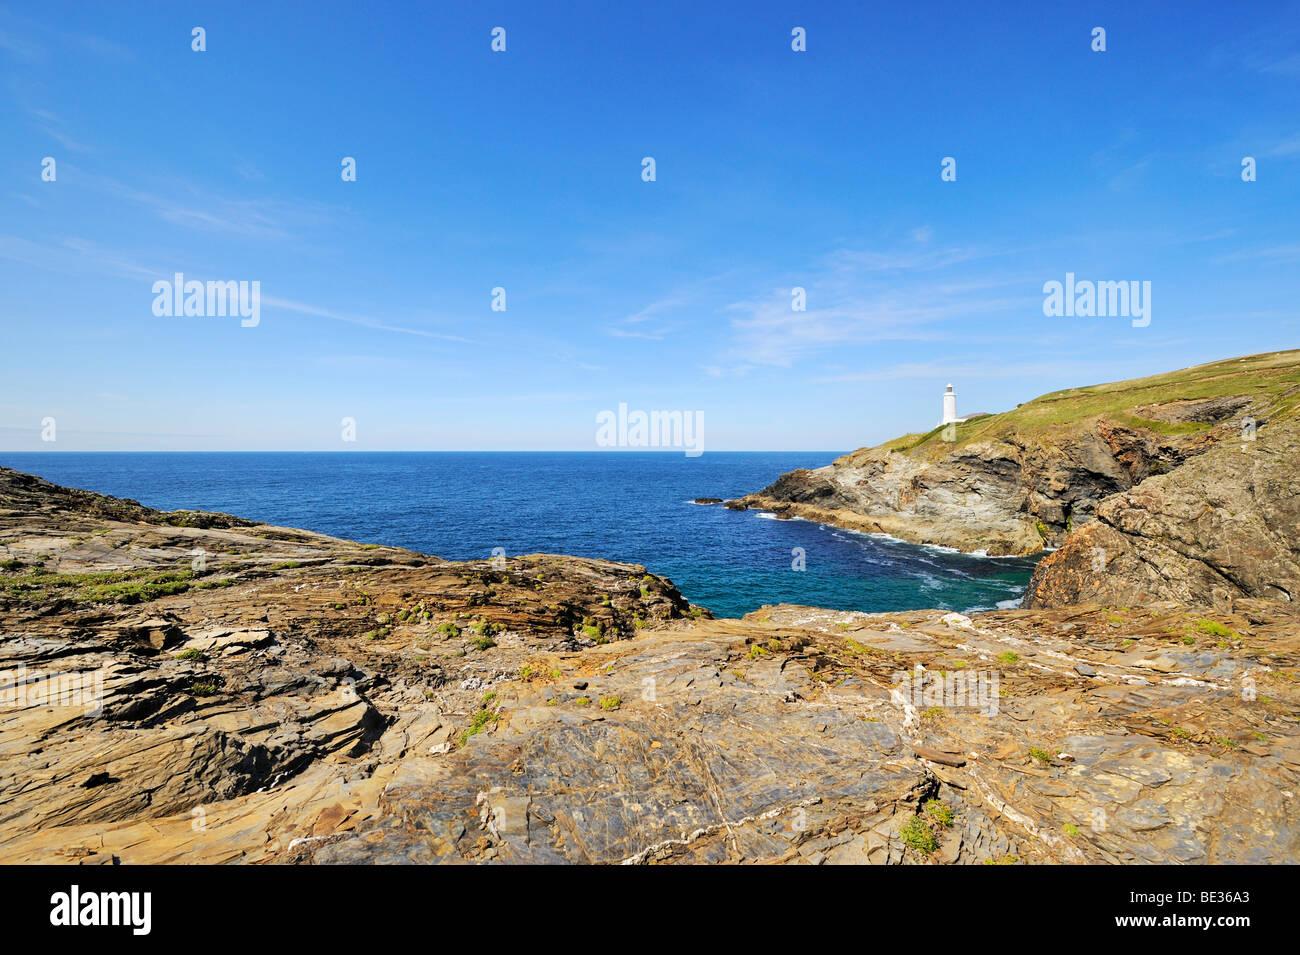 Shale rock on the coast of Trevose Head on the north coast of Cornwall, England, United Kingdom, Europe - Stock Image